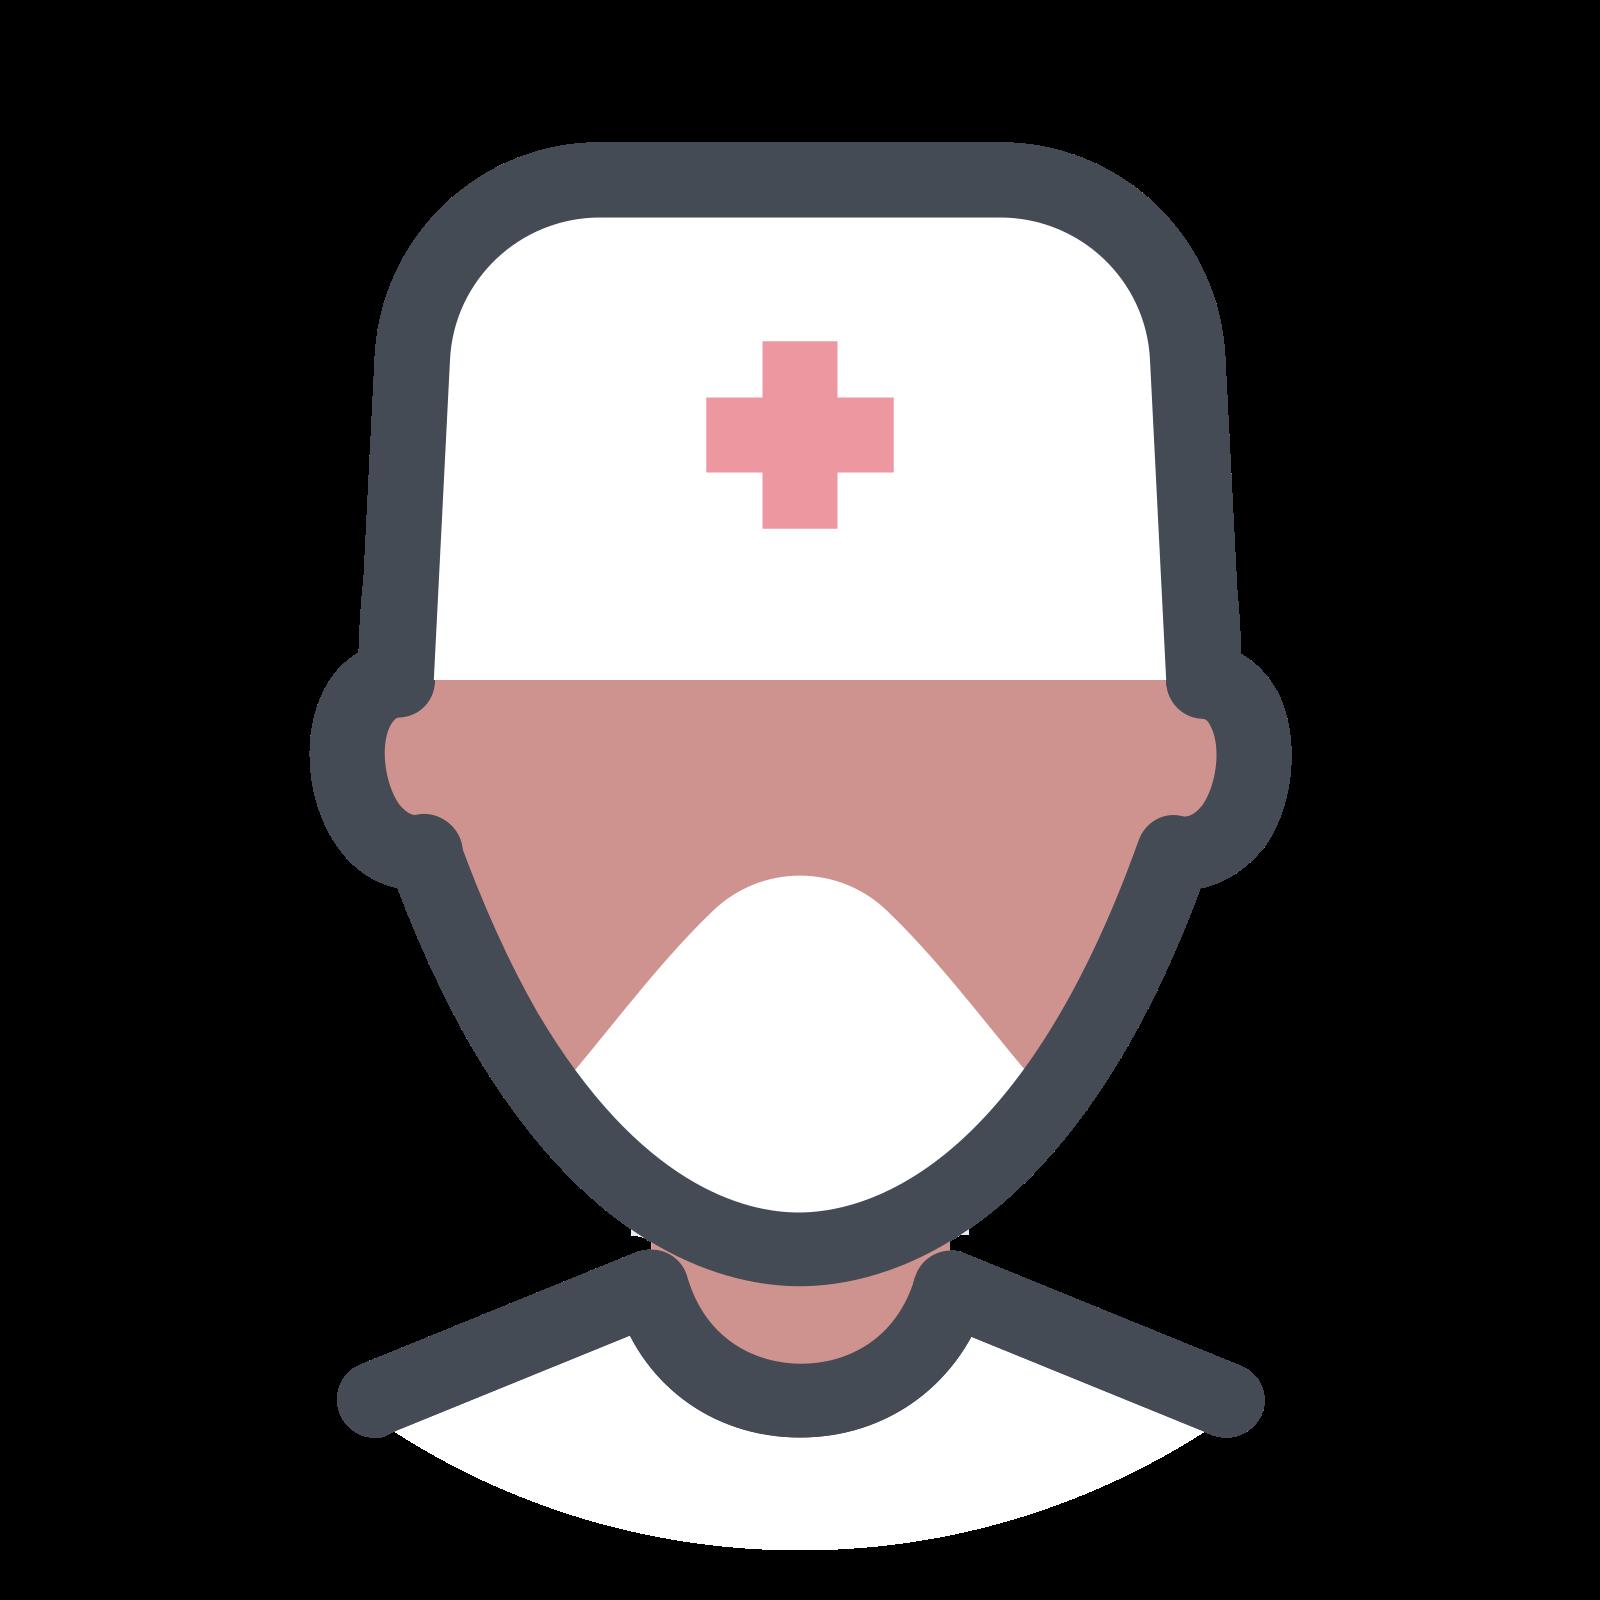 Skóra chirurga typu 4 icon